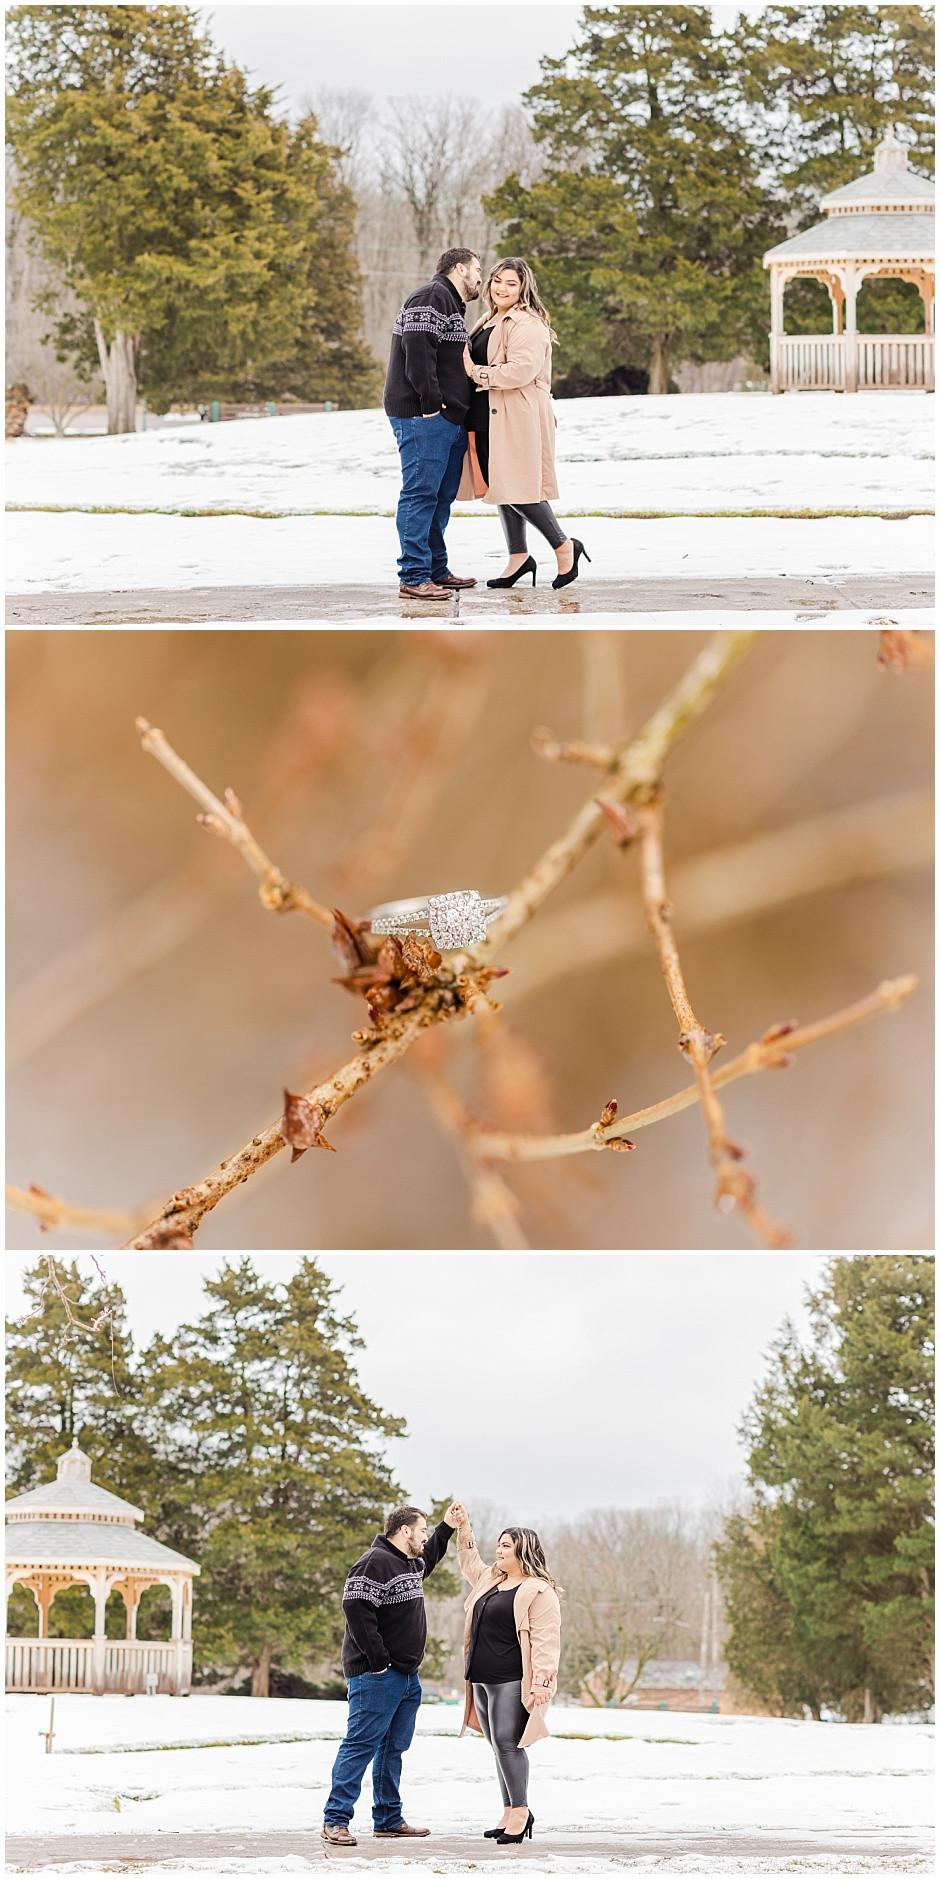 BIRDHAVEN GREENHOUSE ENGAGEMENT SESSION JOLIET IL WEDDING PHOTOGRAPHER